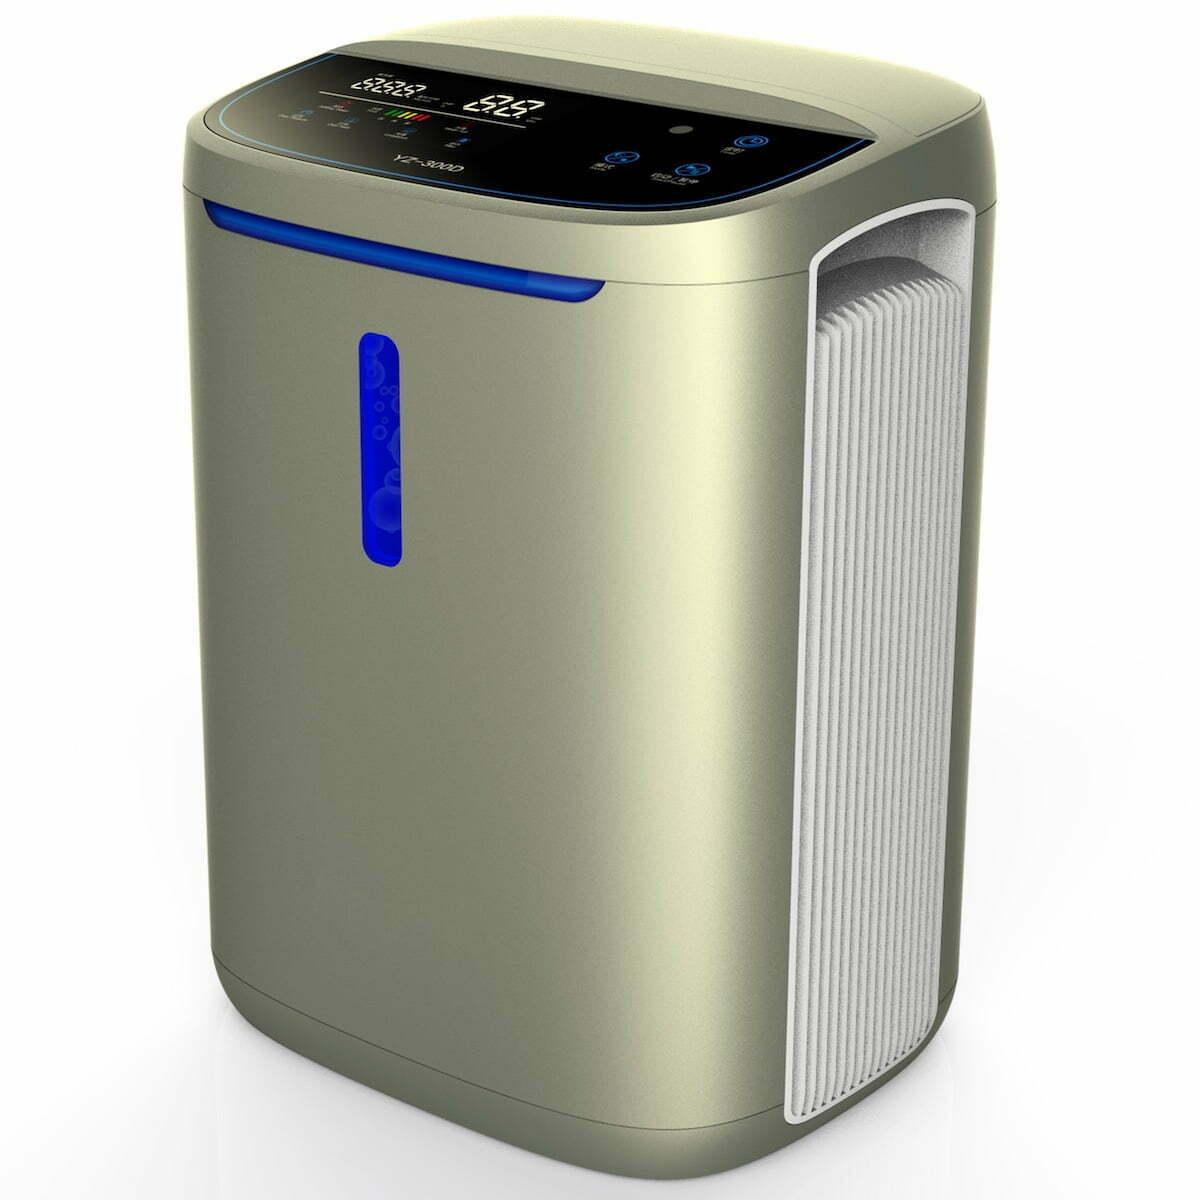 Aquavolta-H2-Inspirator-300-H2-Generator-mit-300-oder-600-ml-Wasserstoff-Gas-Ausbeute-perspektive-1200x1ptTmREvxpfu